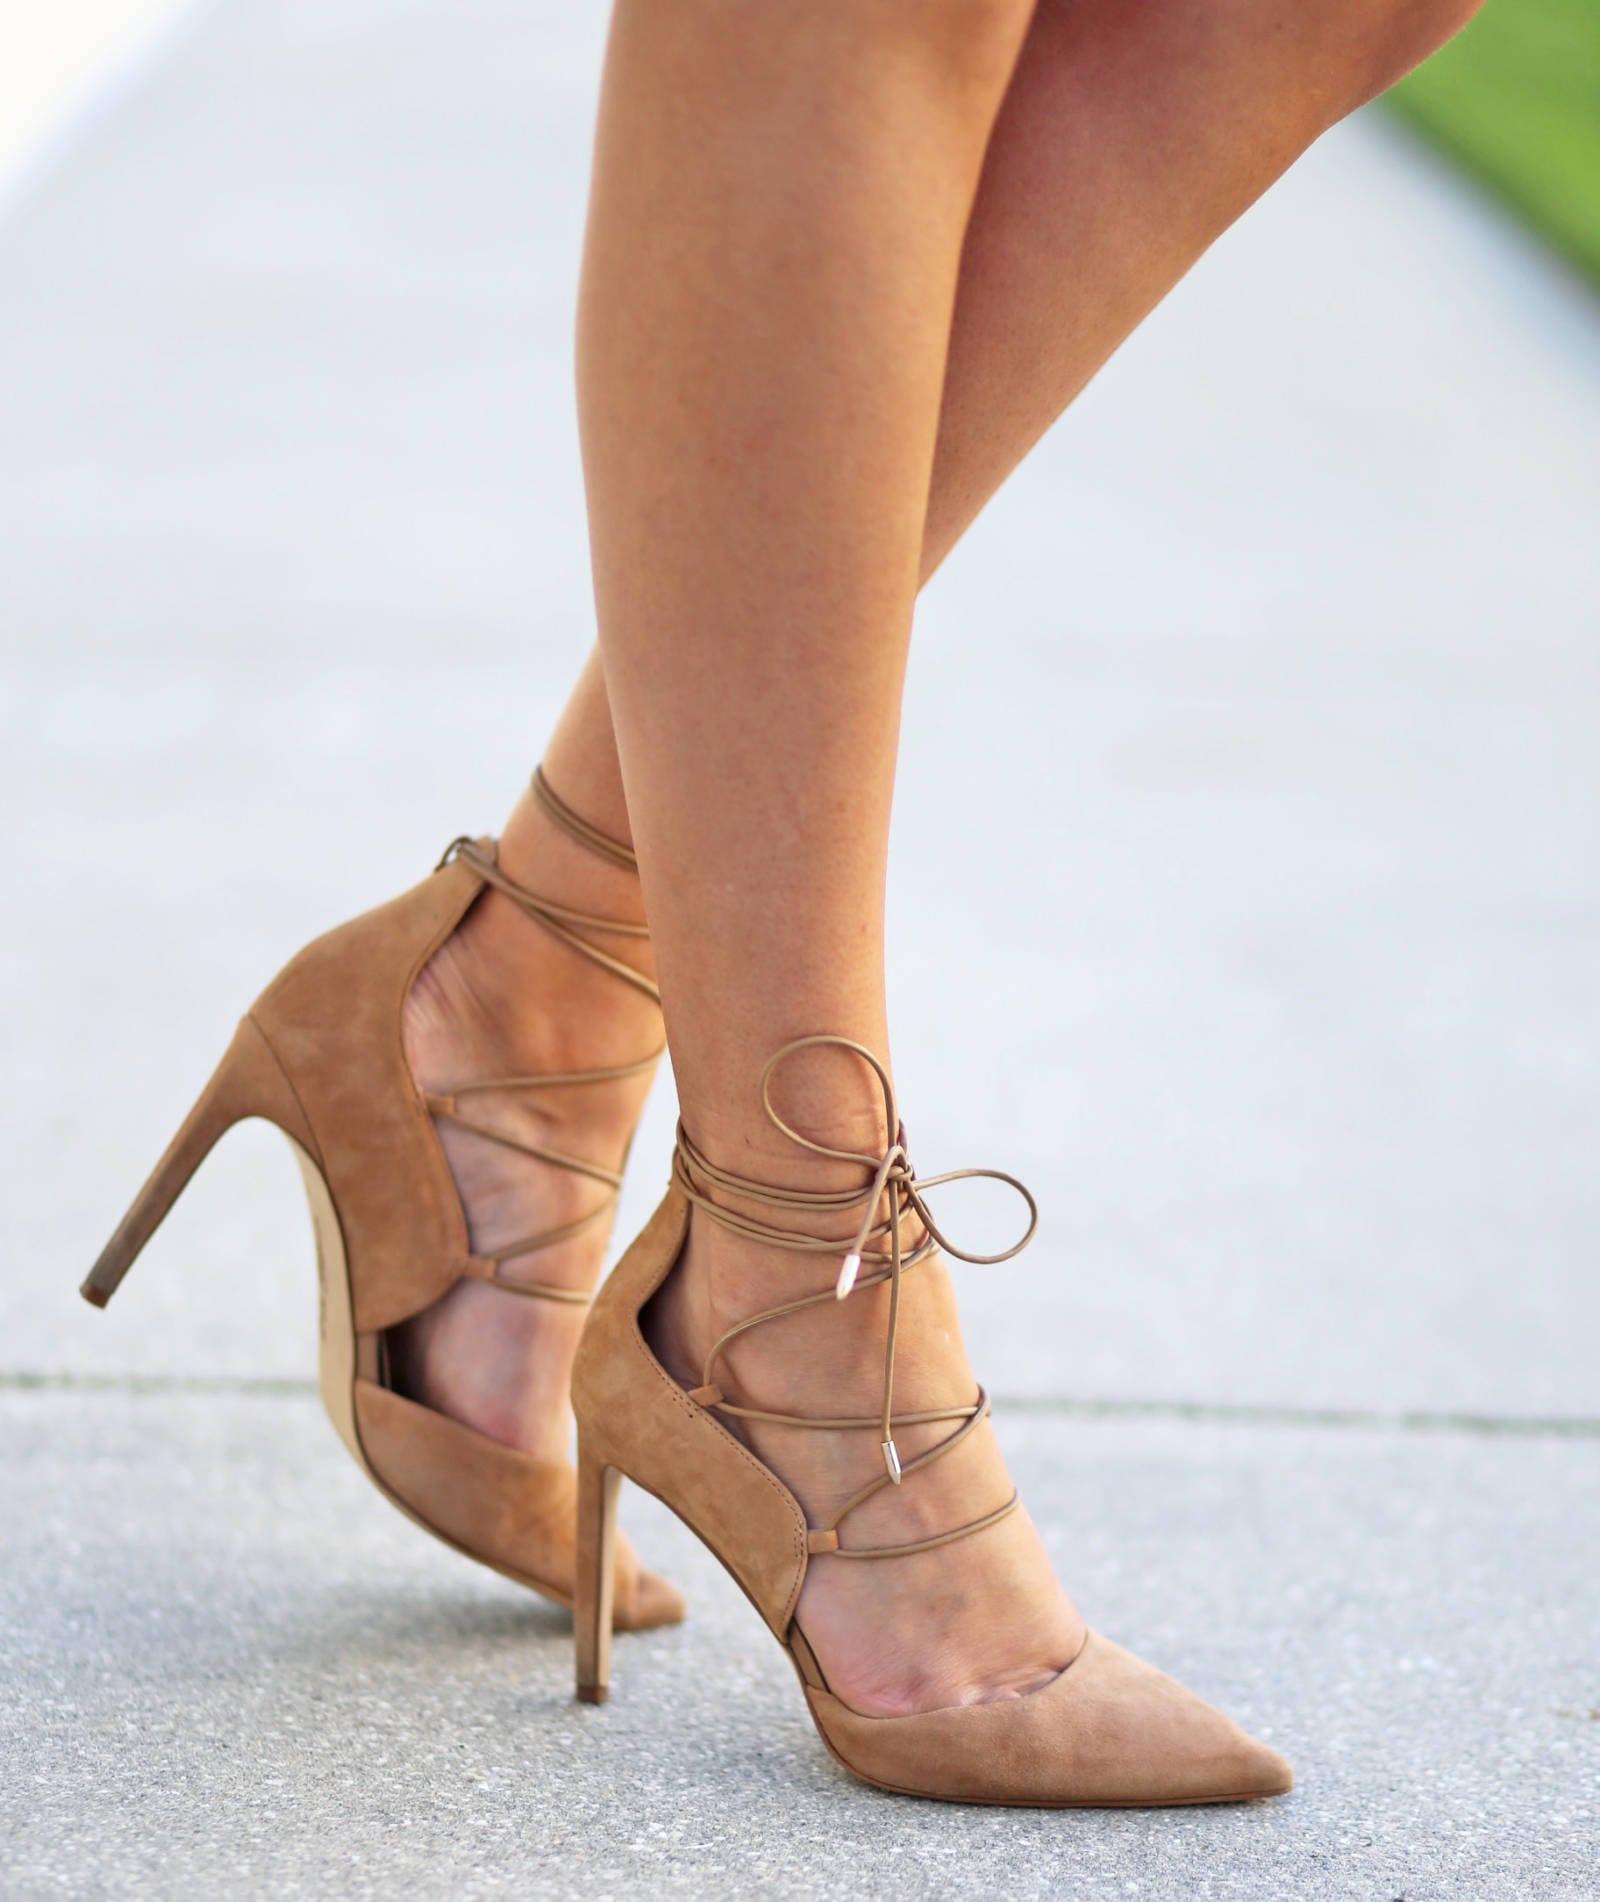 sam-edelman-lace-up-heels